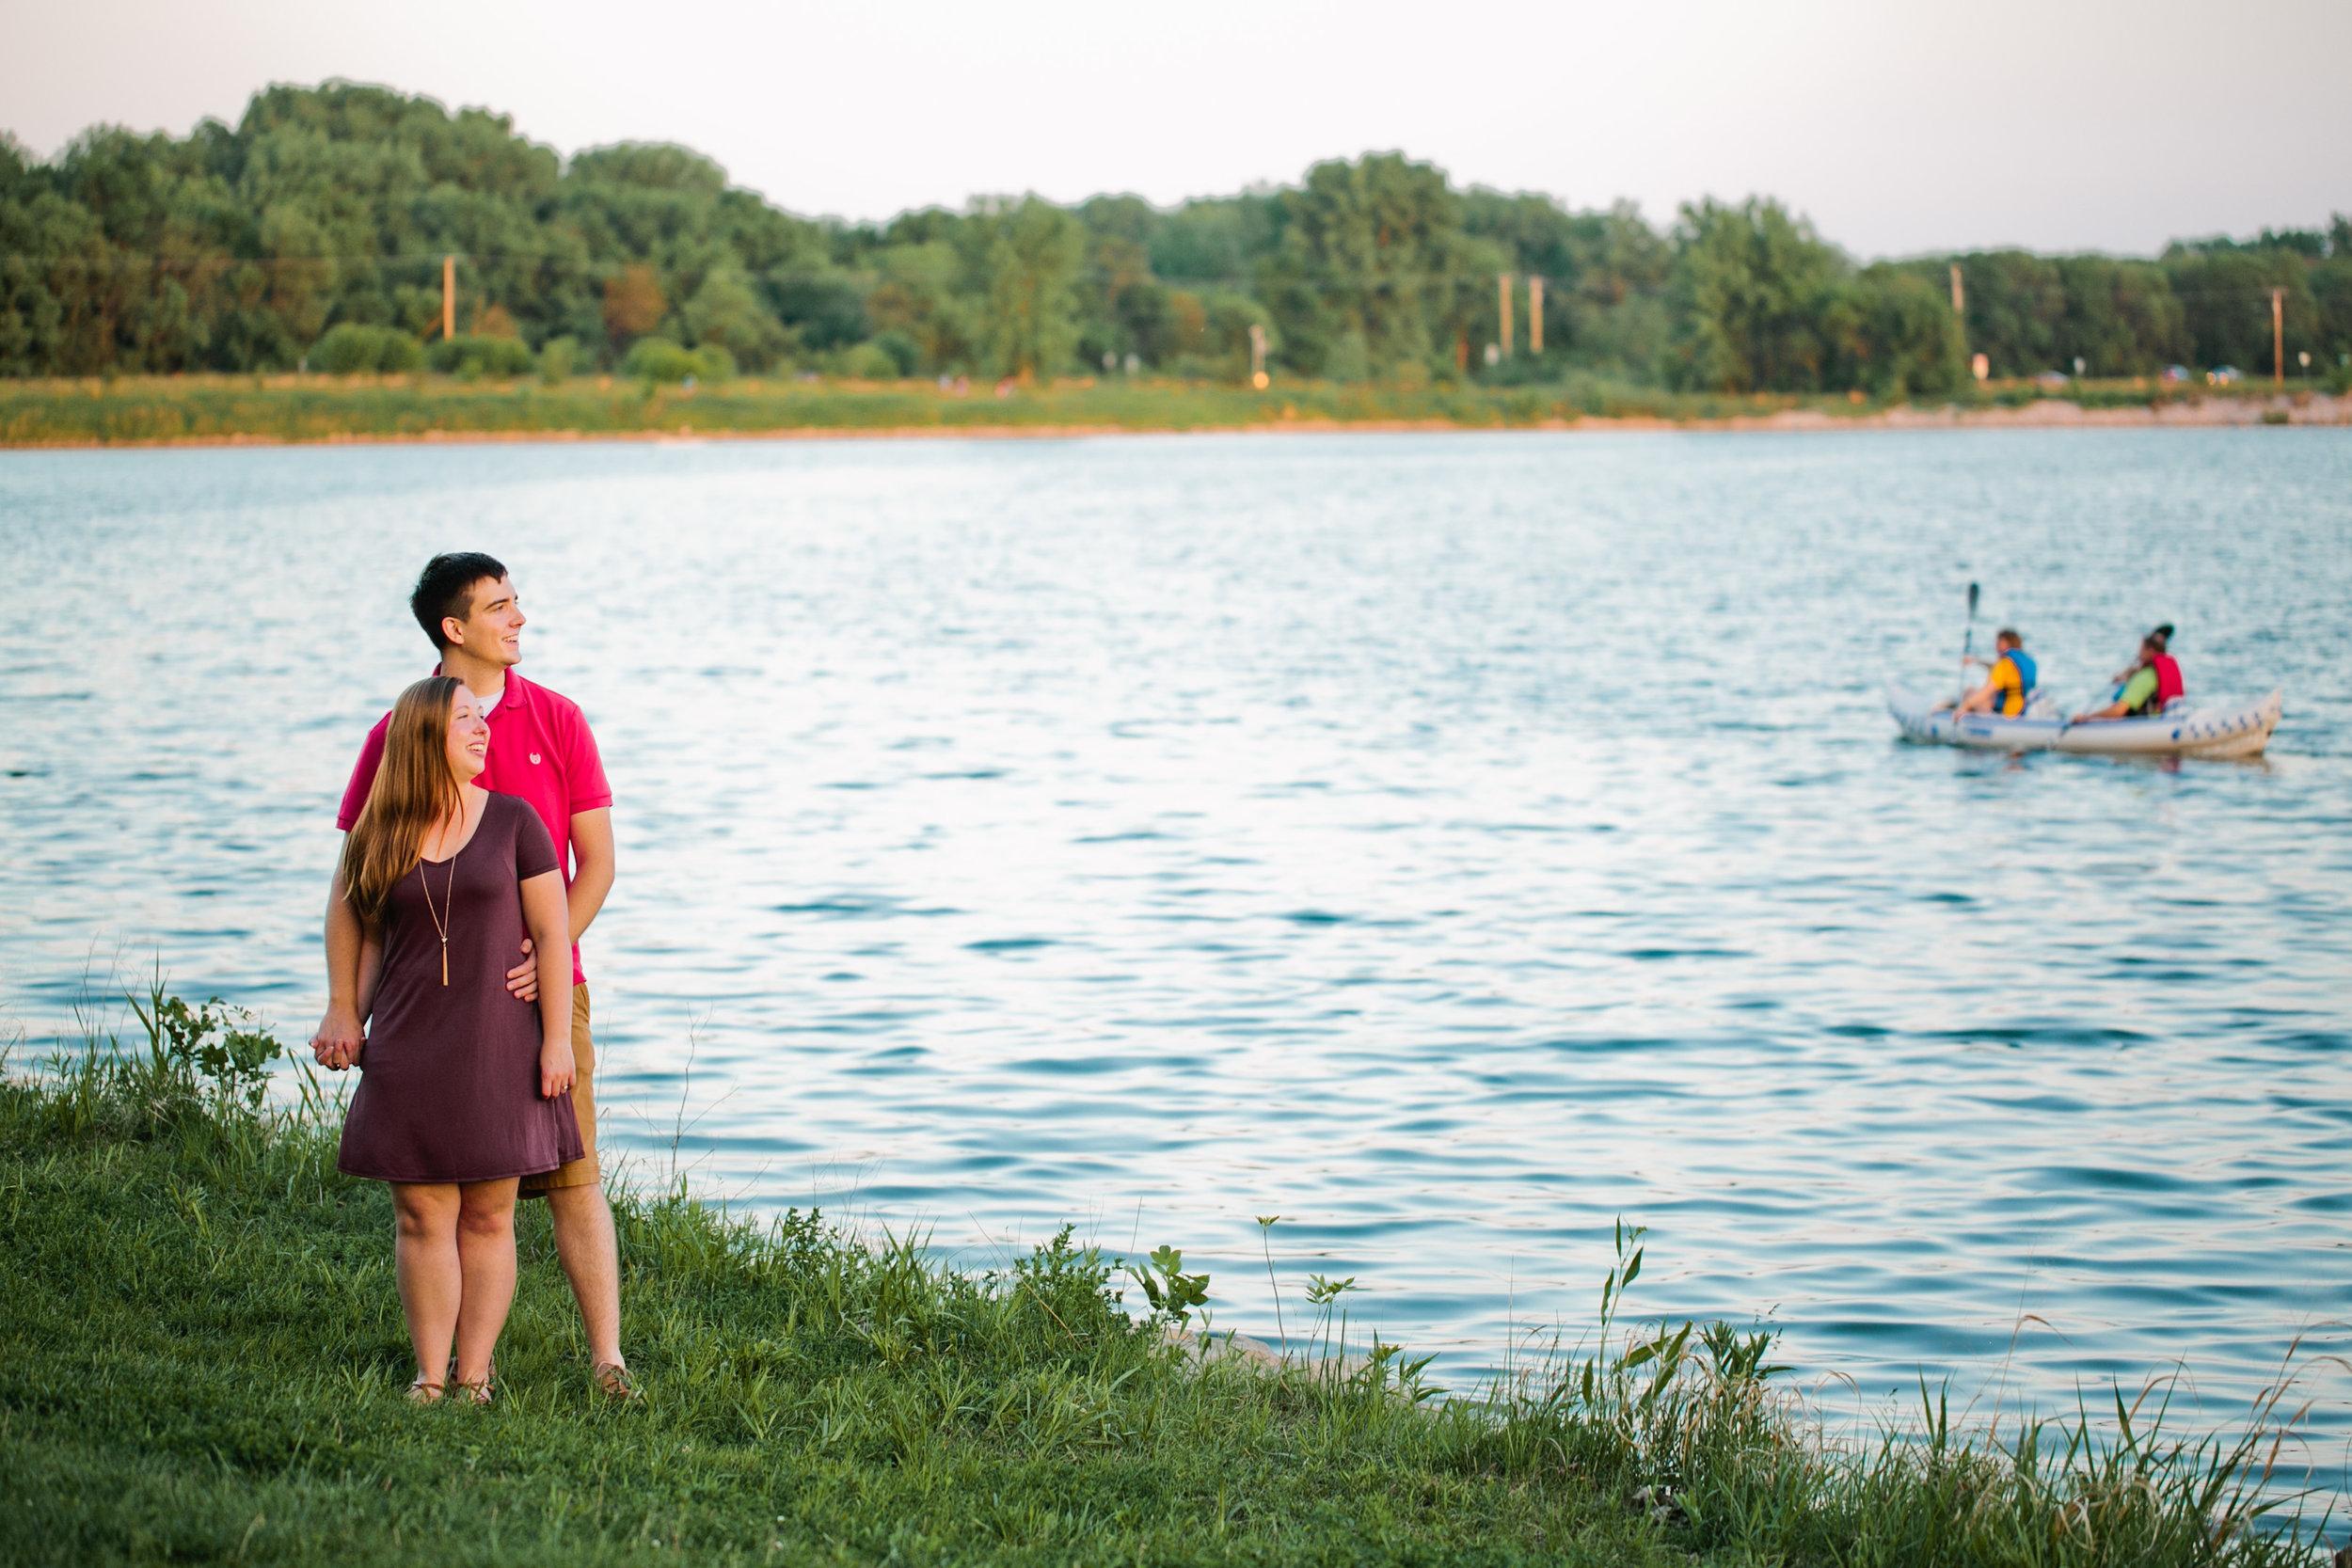 engagement-session-lake-canoes-summer